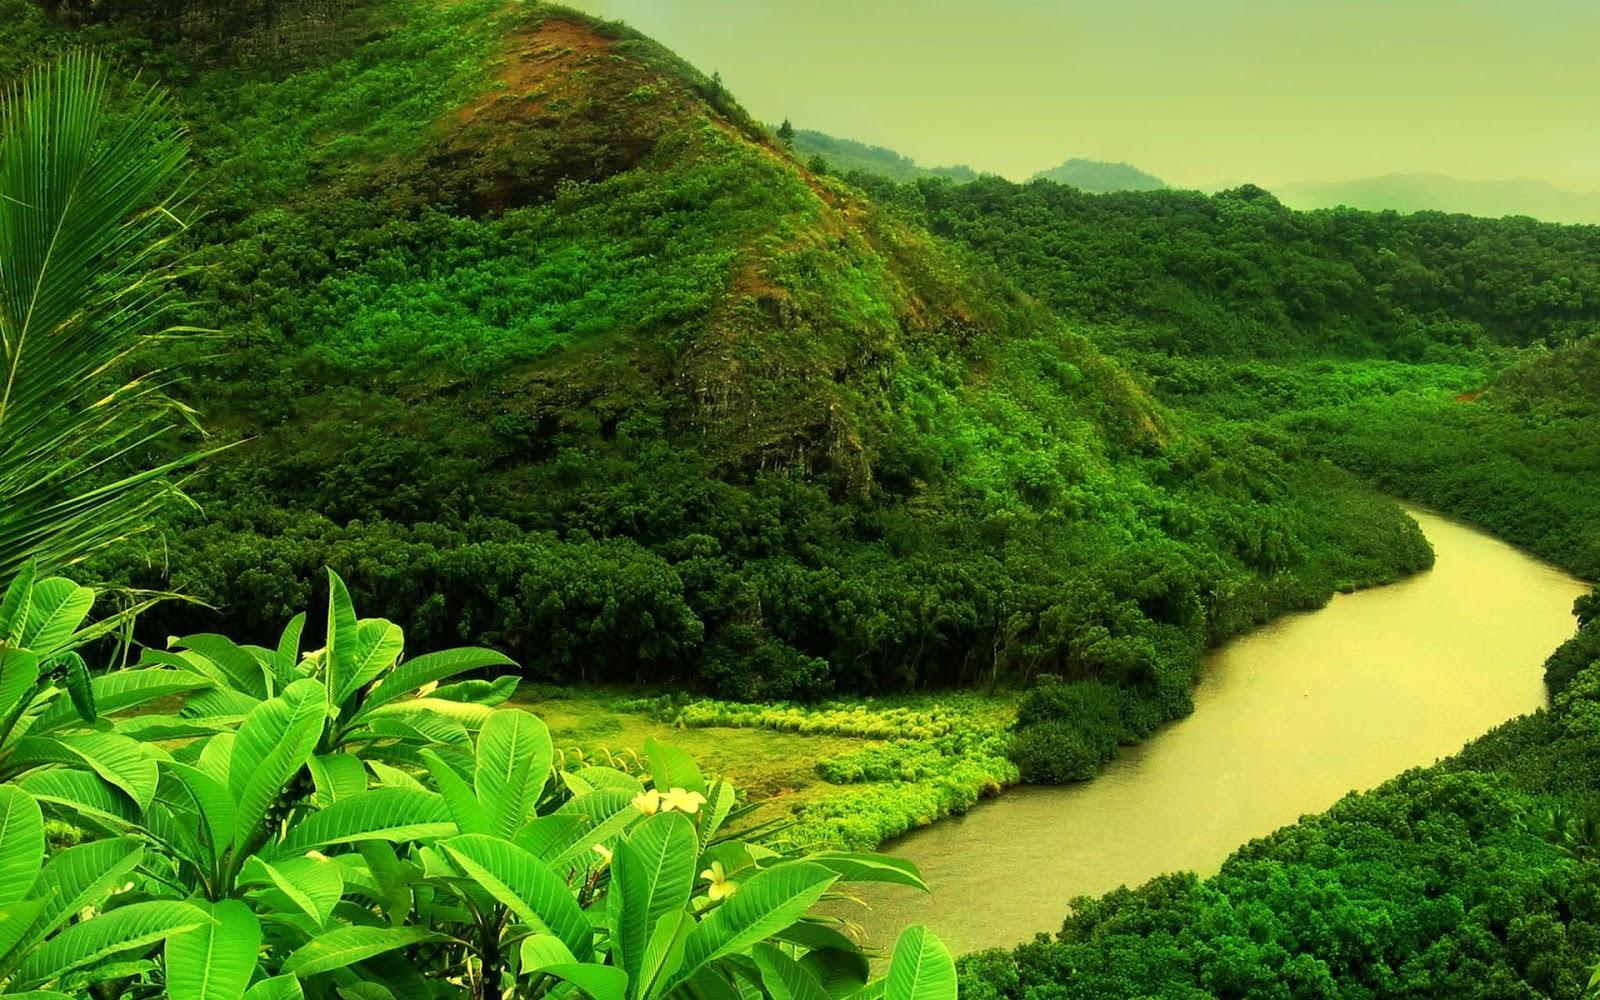 greenery wallpapers wallpapers for desktop free